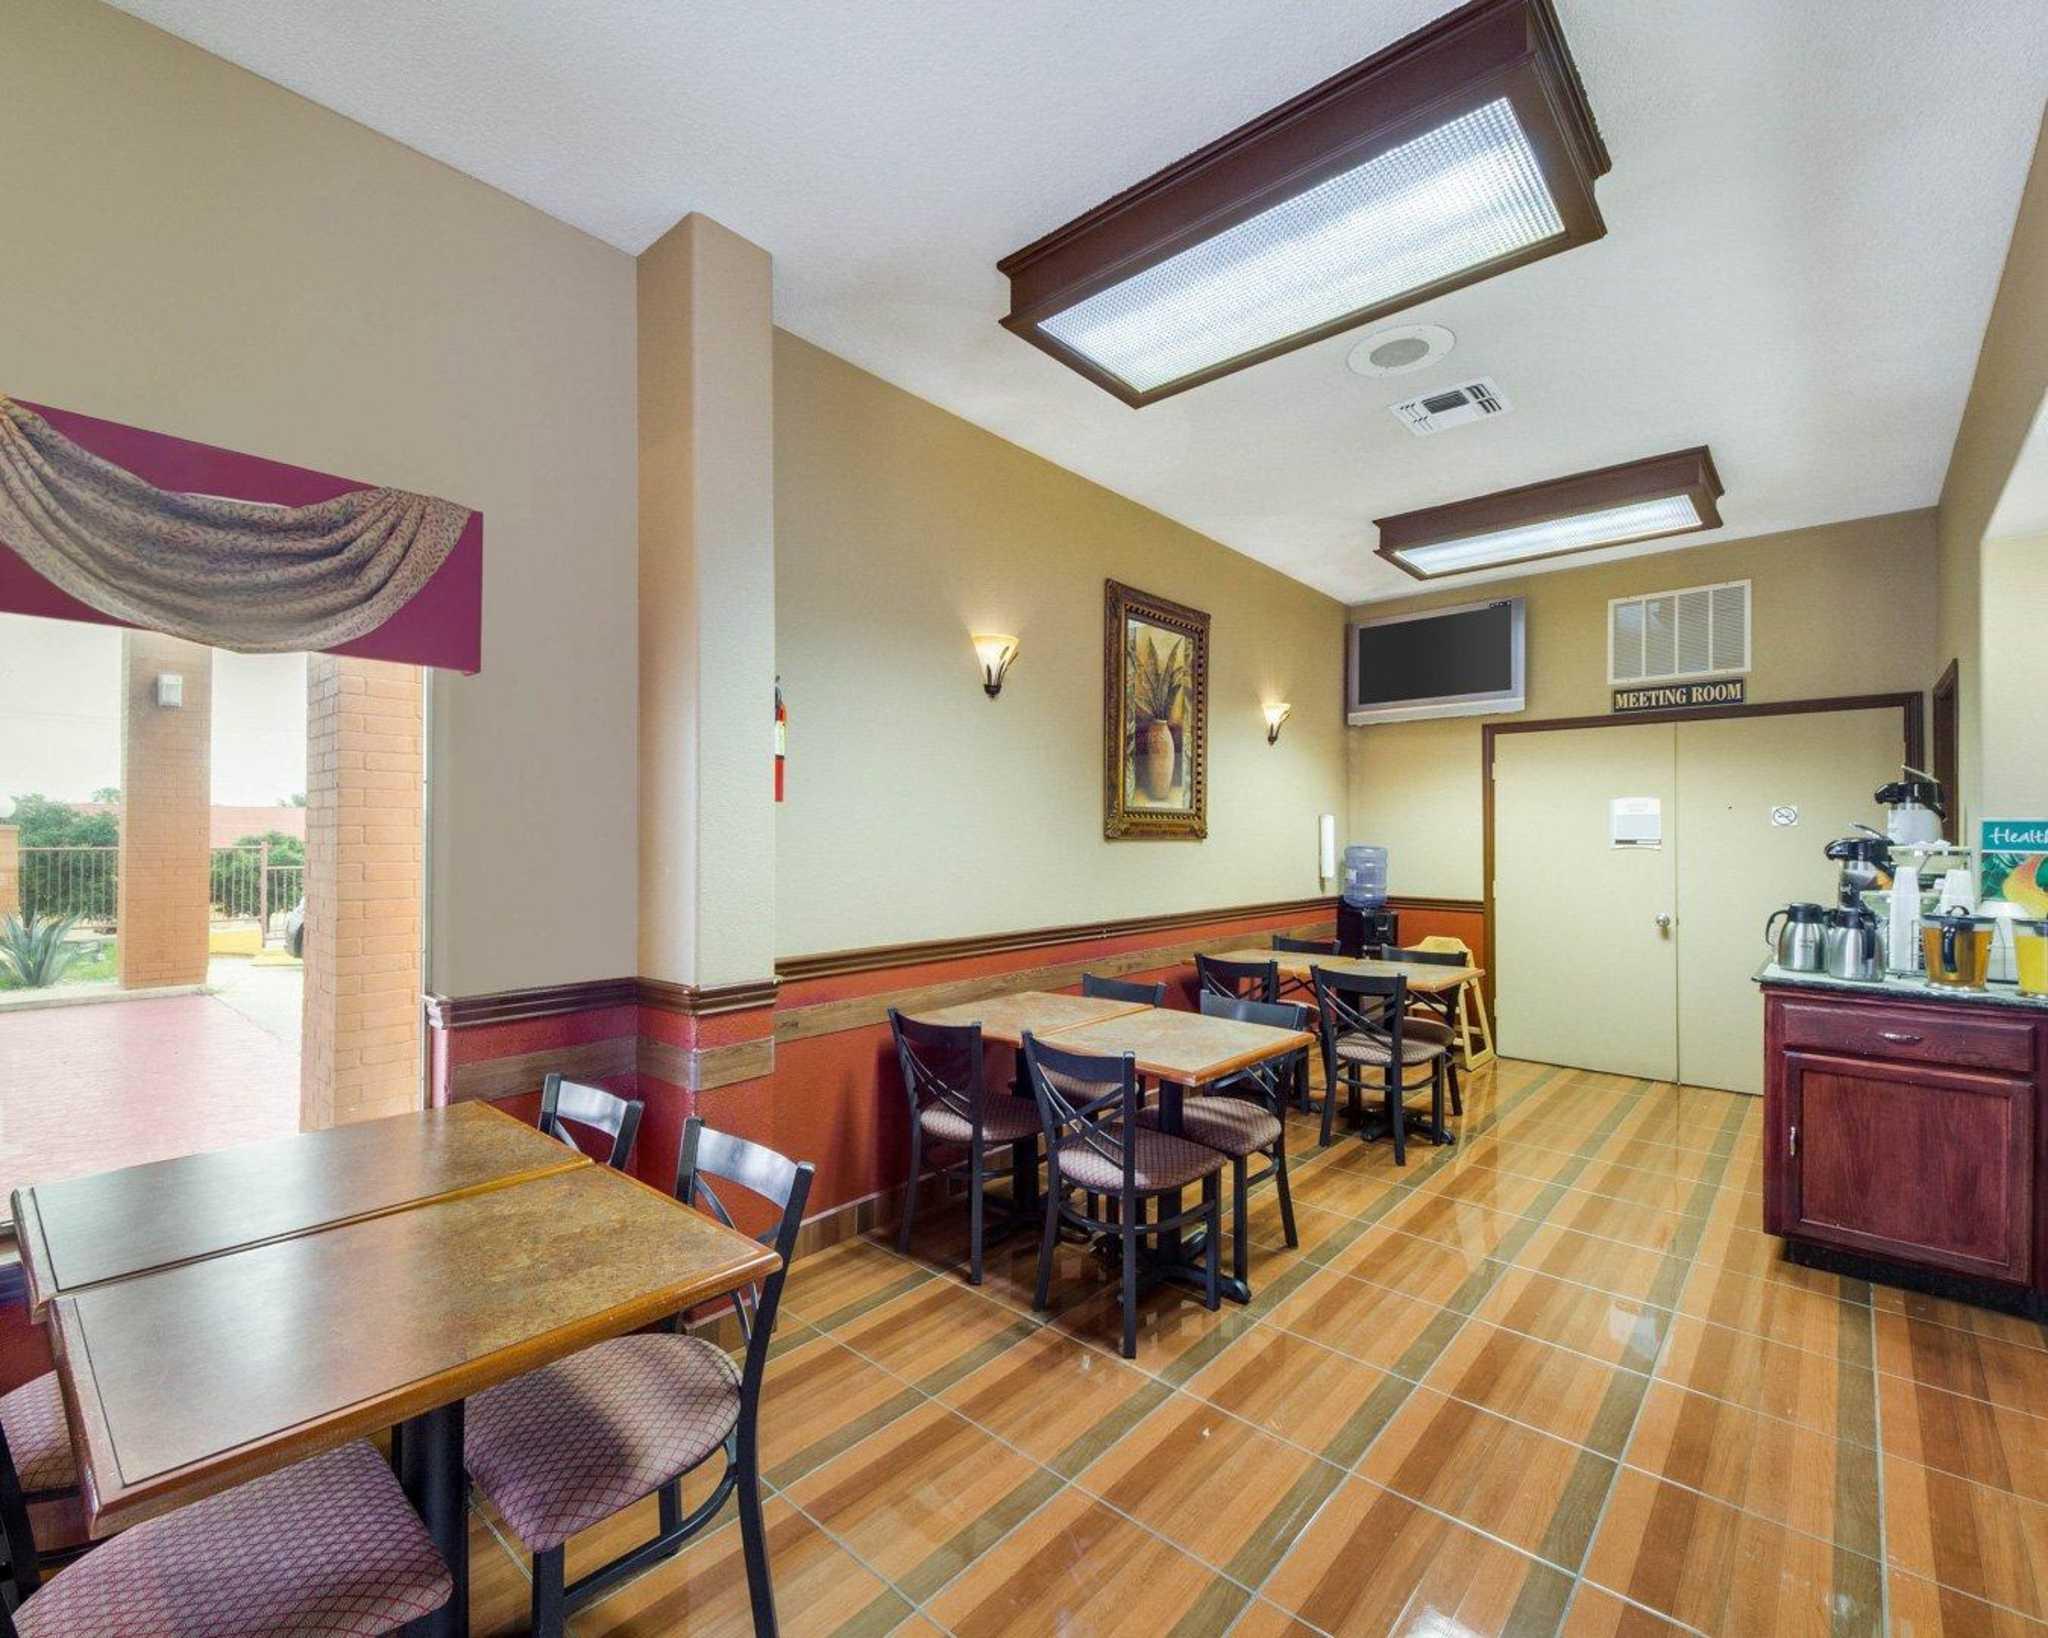 Quality Inn & Suites Eagle Pass image 19